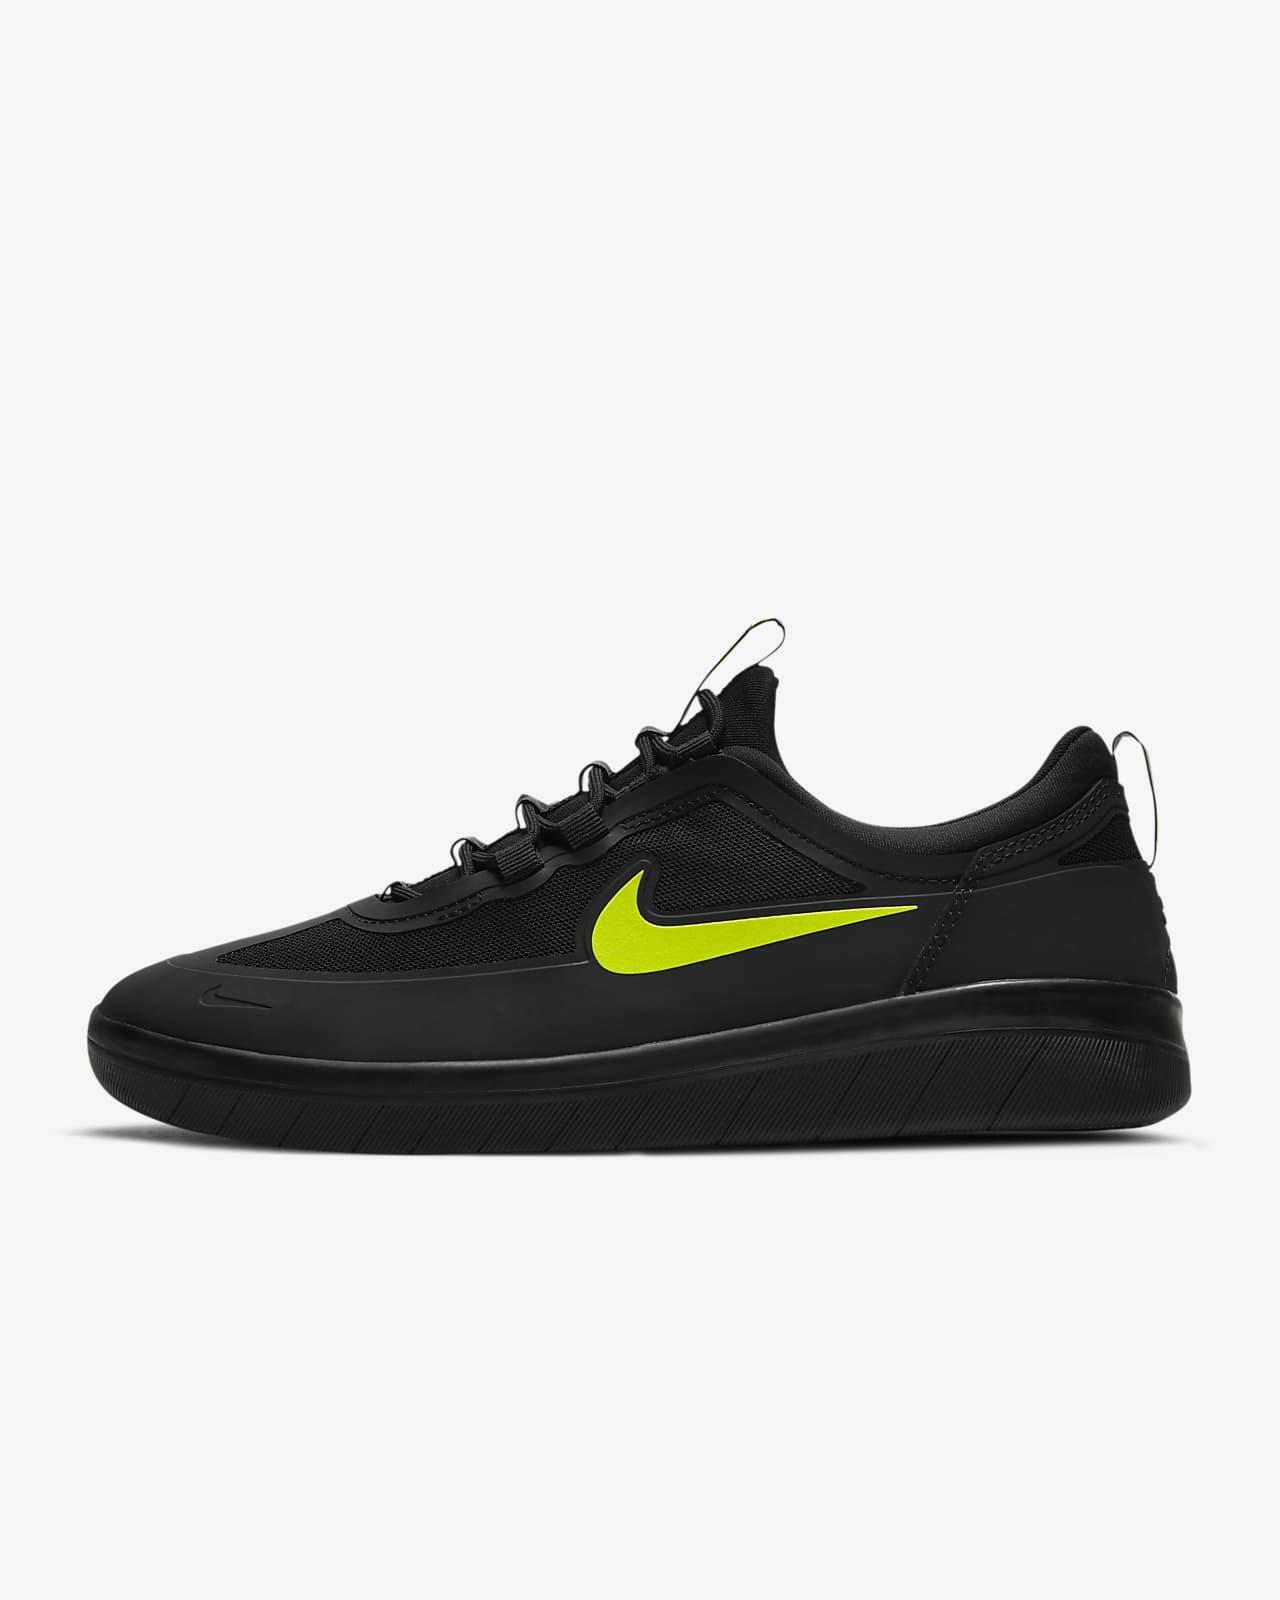 Chaussure de skateboard Nike SB Nyjah Free2